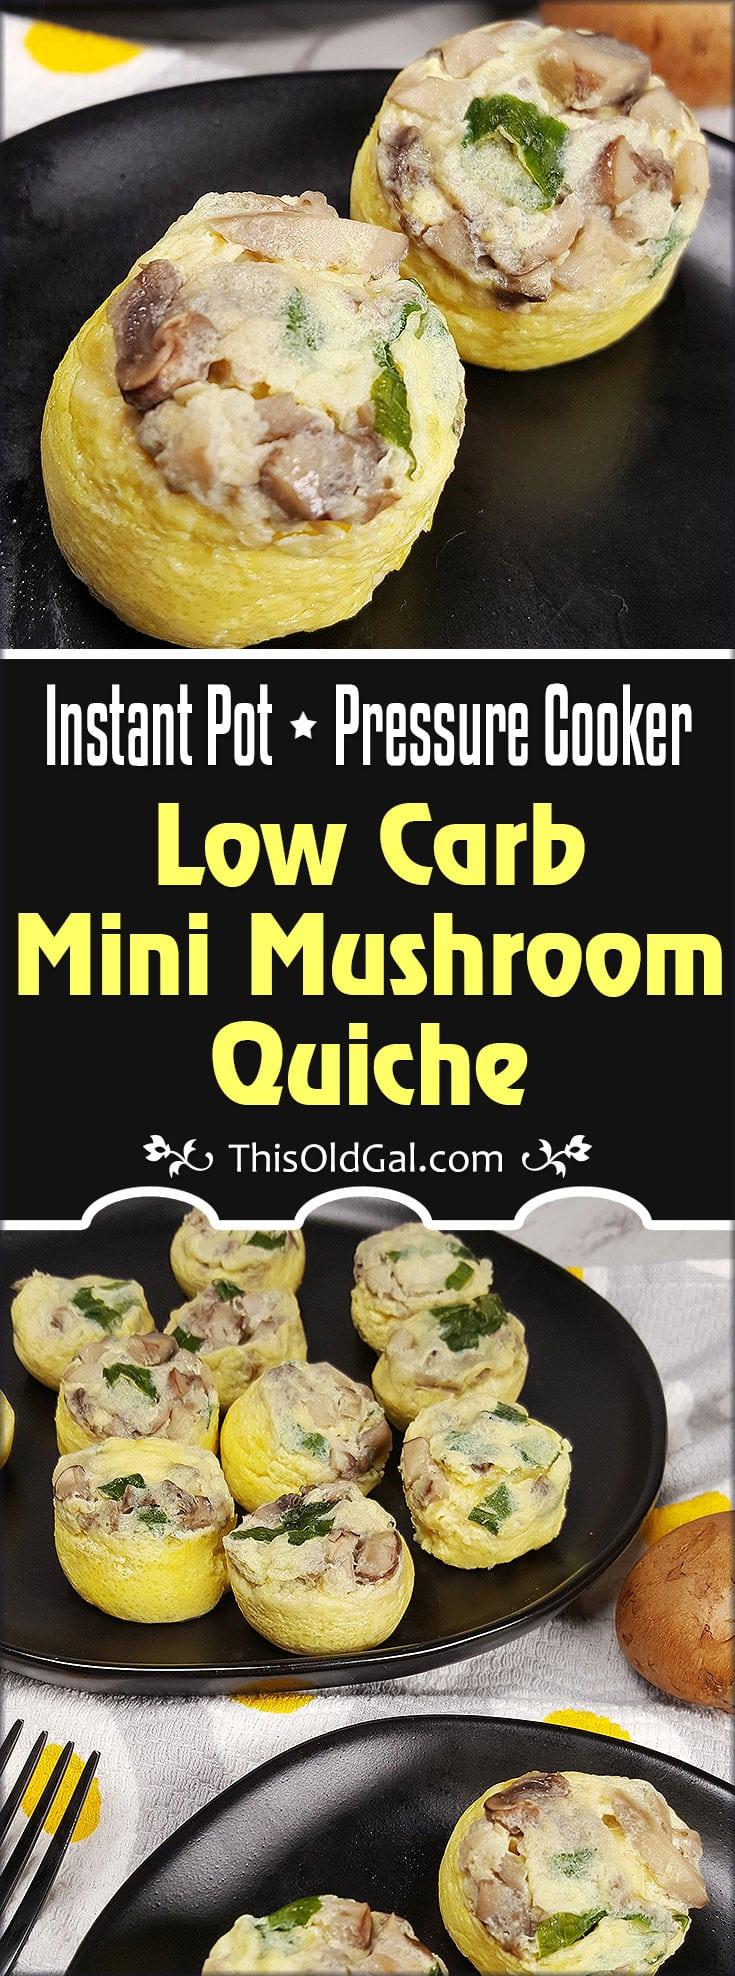 Instant Pot Pressure Cooker Low Carb Mini Mushroom Quiche